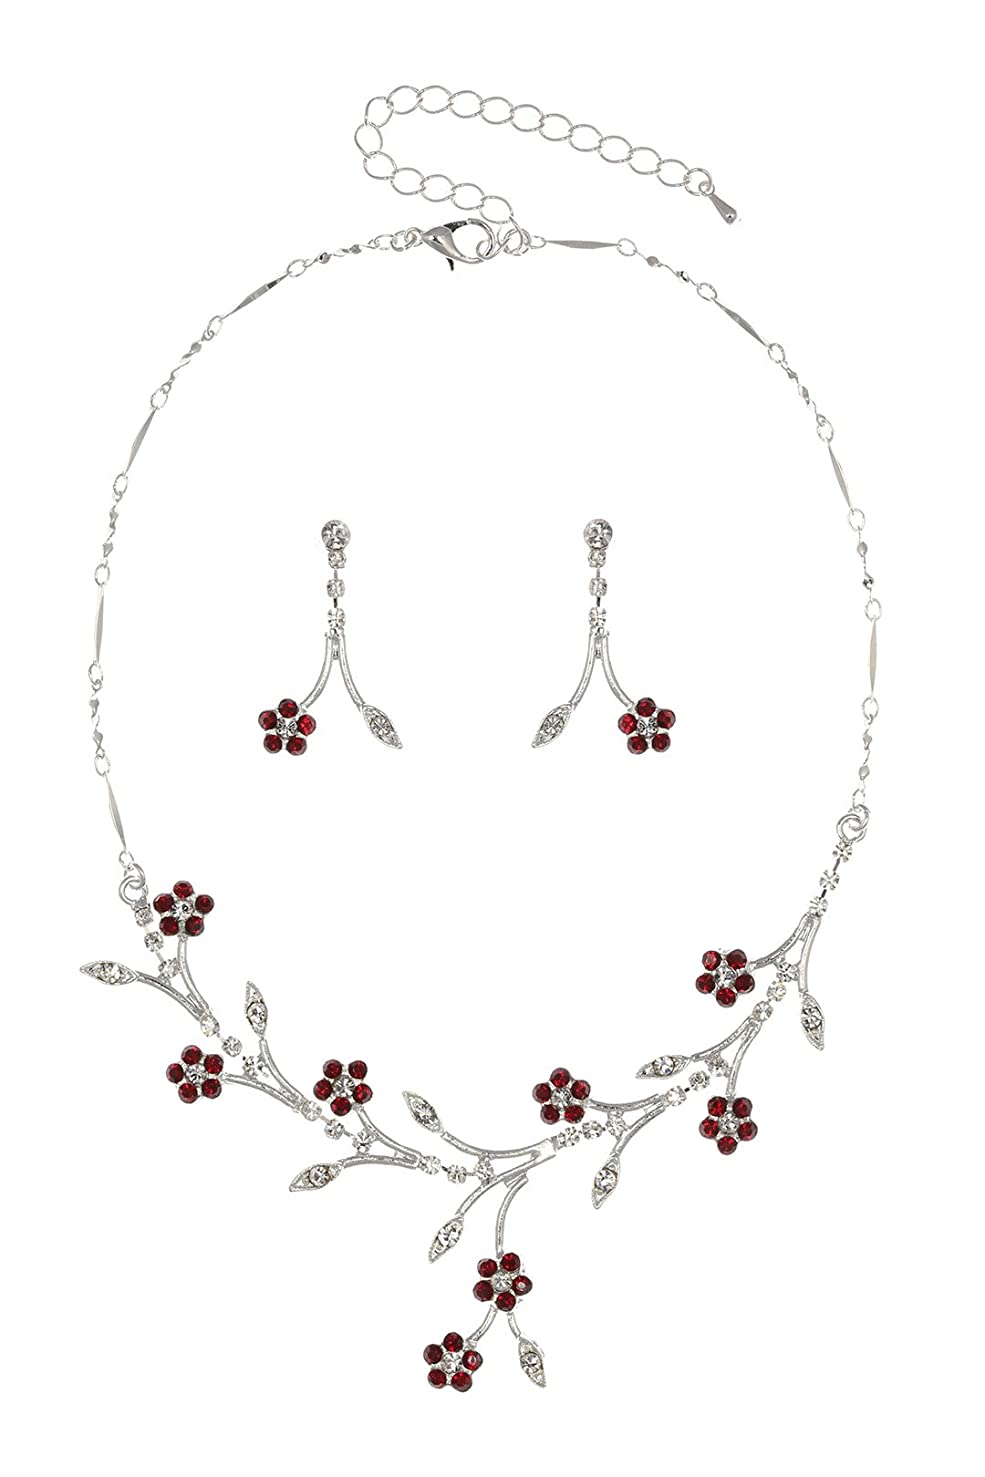 Crystal Flower Leaf Bridal Wedding Necklace Earrings Set - Silver Plated Red Rhinestones N160